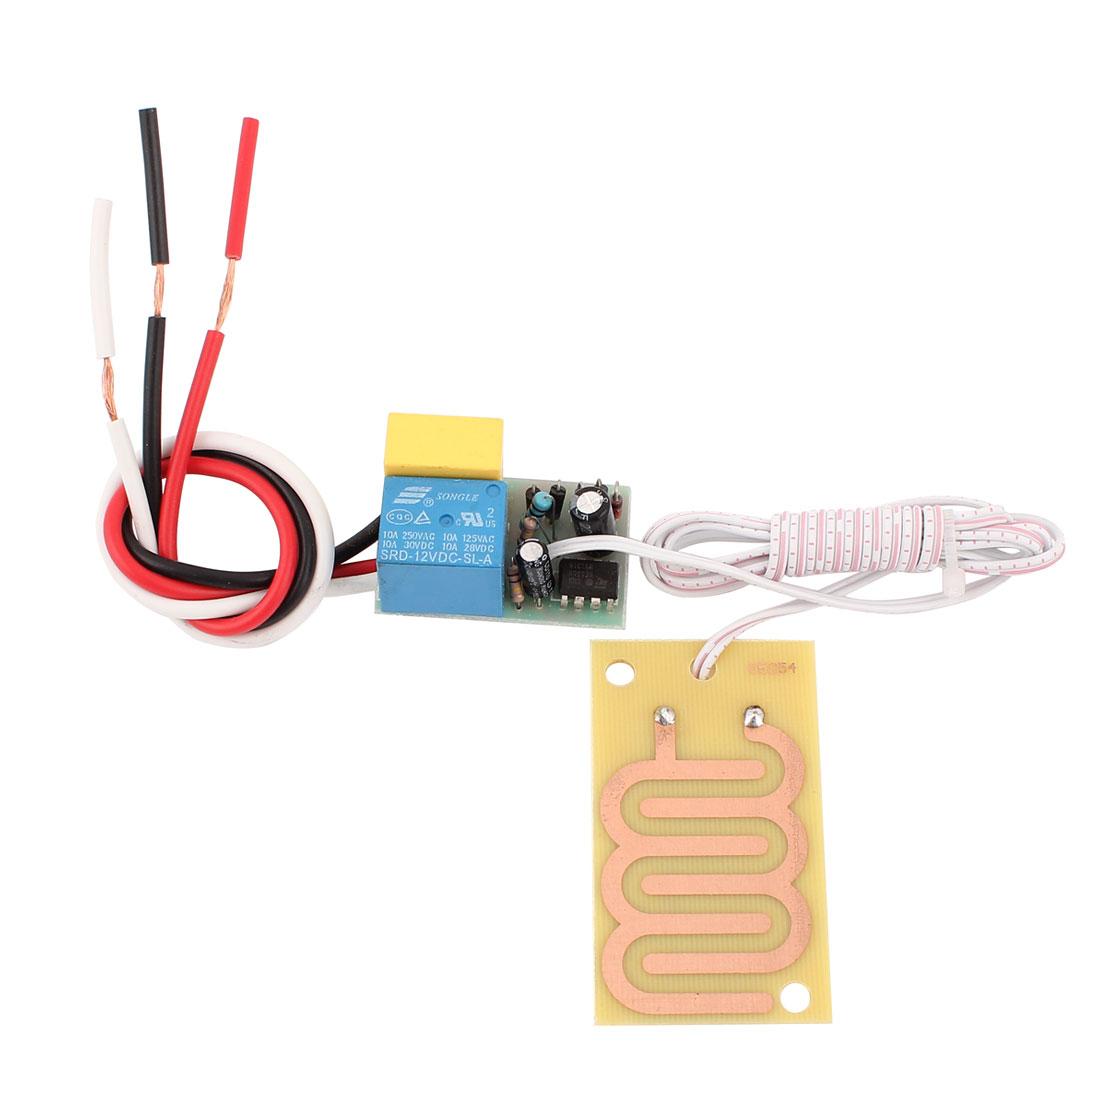 AC 110V 10A Rain Detector Raindrop Detection Sensor Module